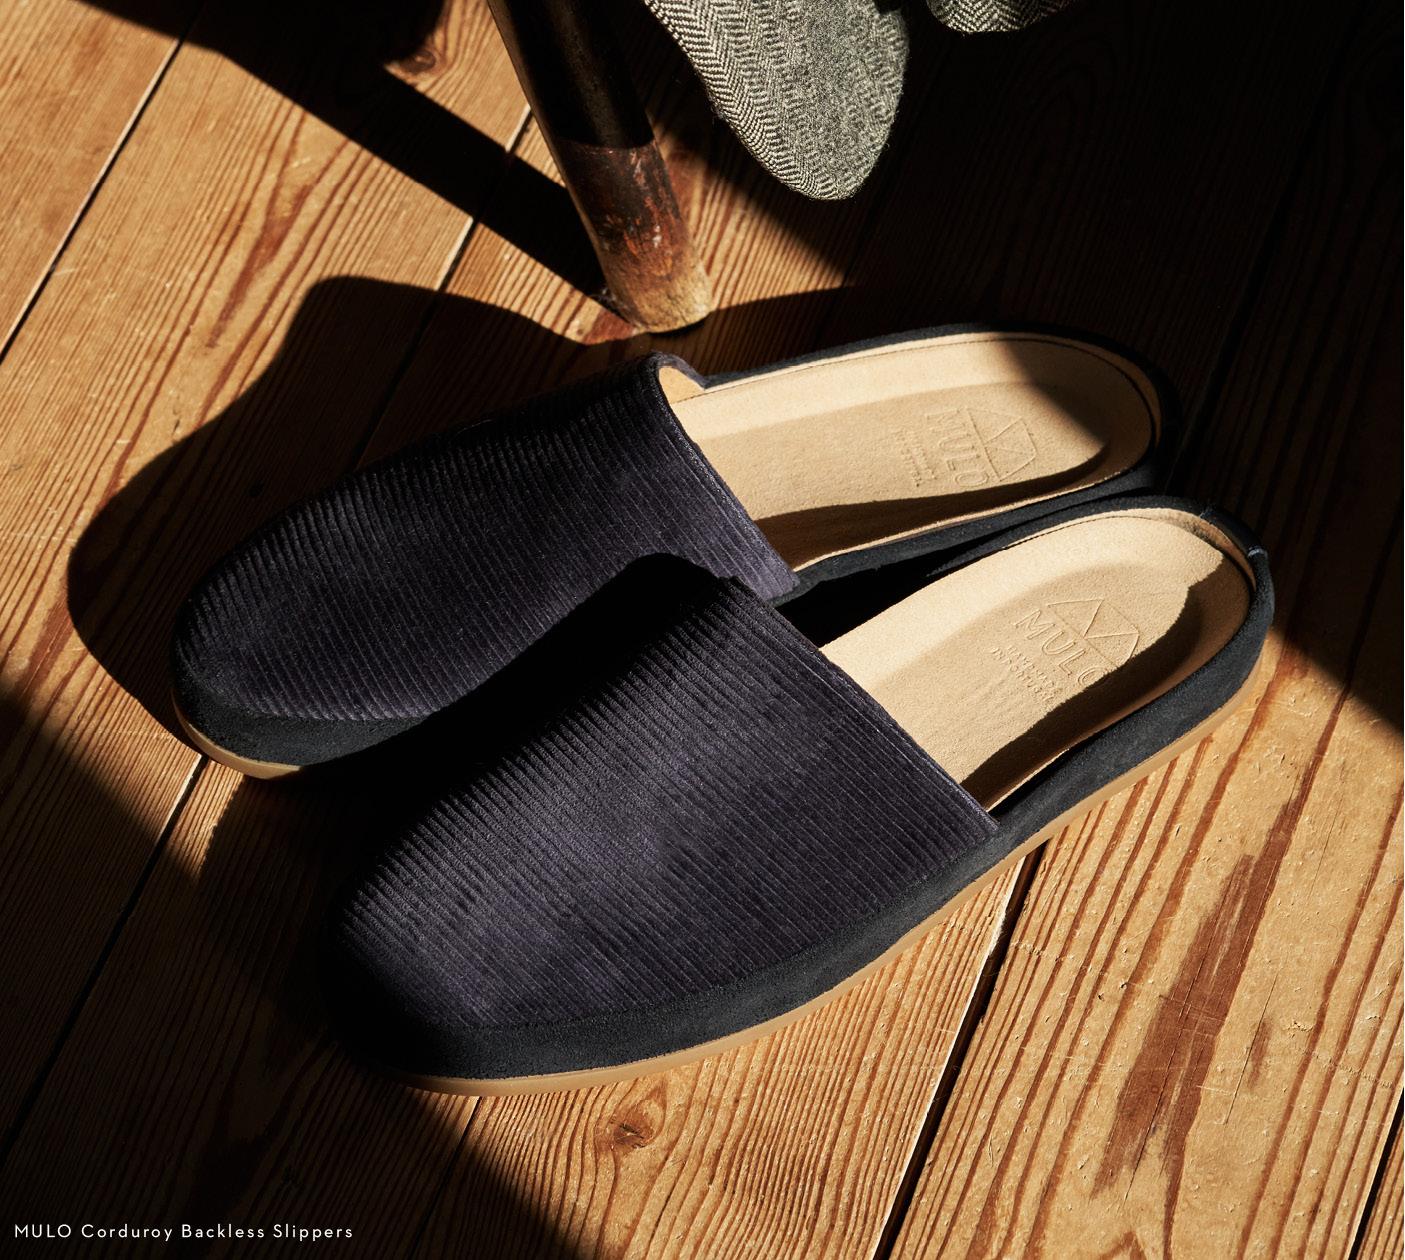 Heritage Fabrics - Corduroy Slippers for Men